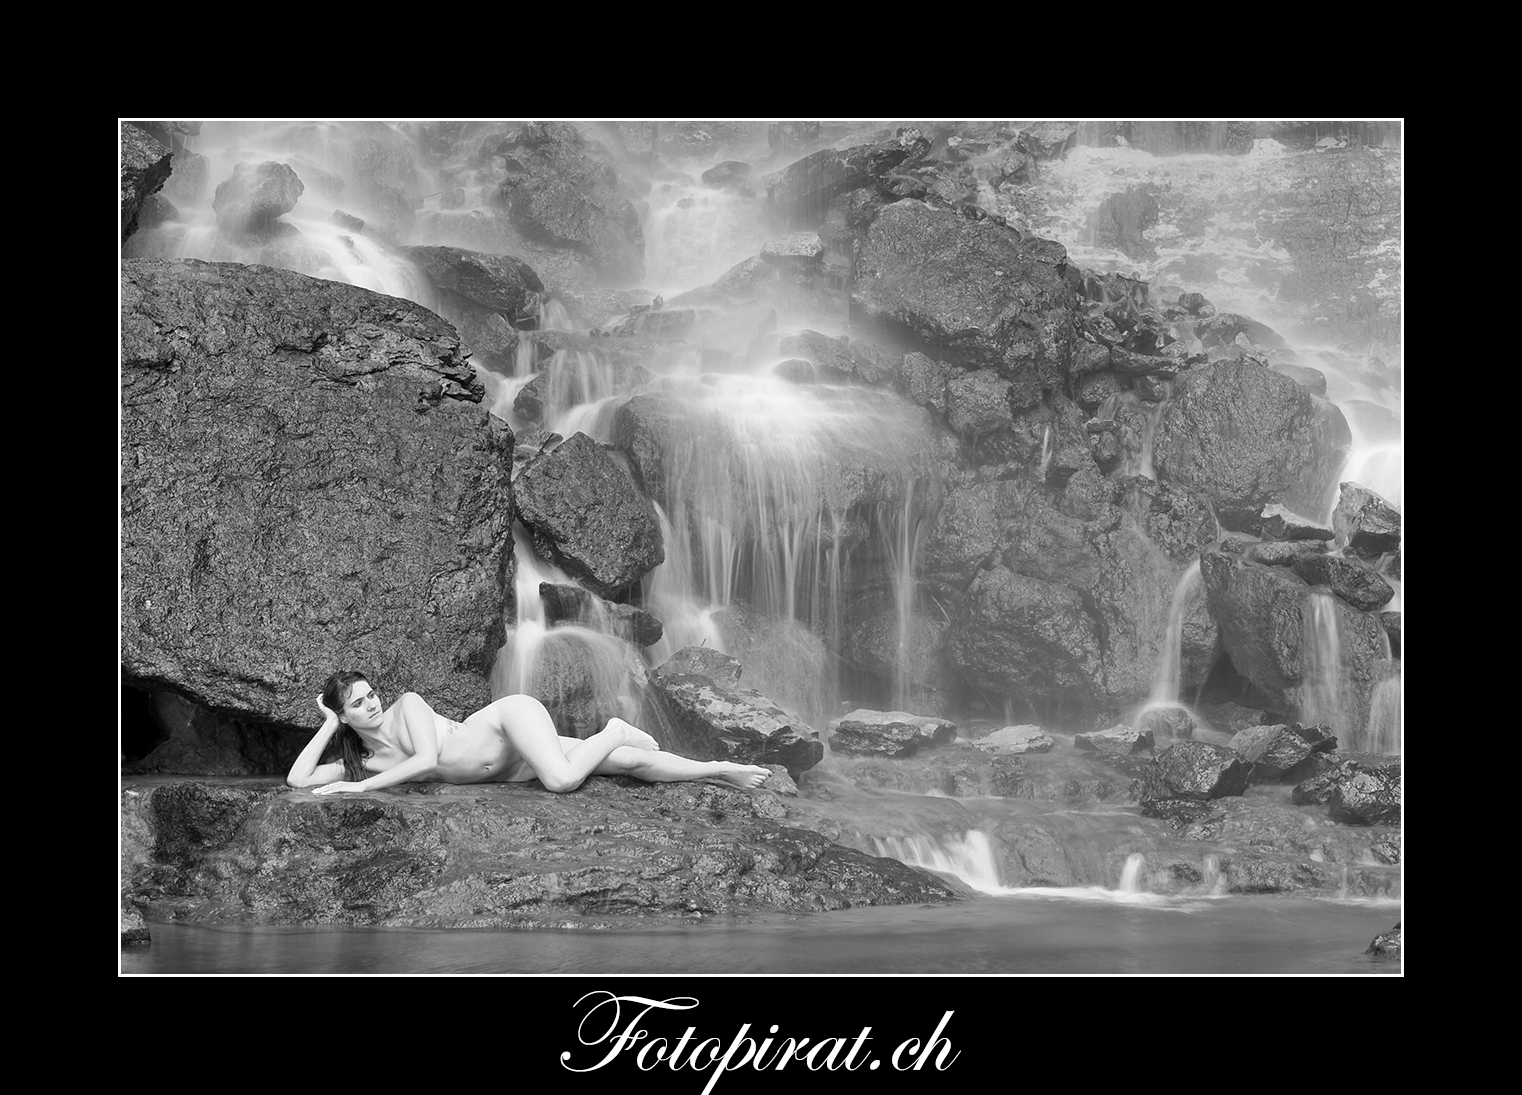 Fotoshooting, outdoor, Modelagentur, sexy Model, Sportmodel, Fitnessmodel, Nudeart, Nude, Akt, Wasserfall